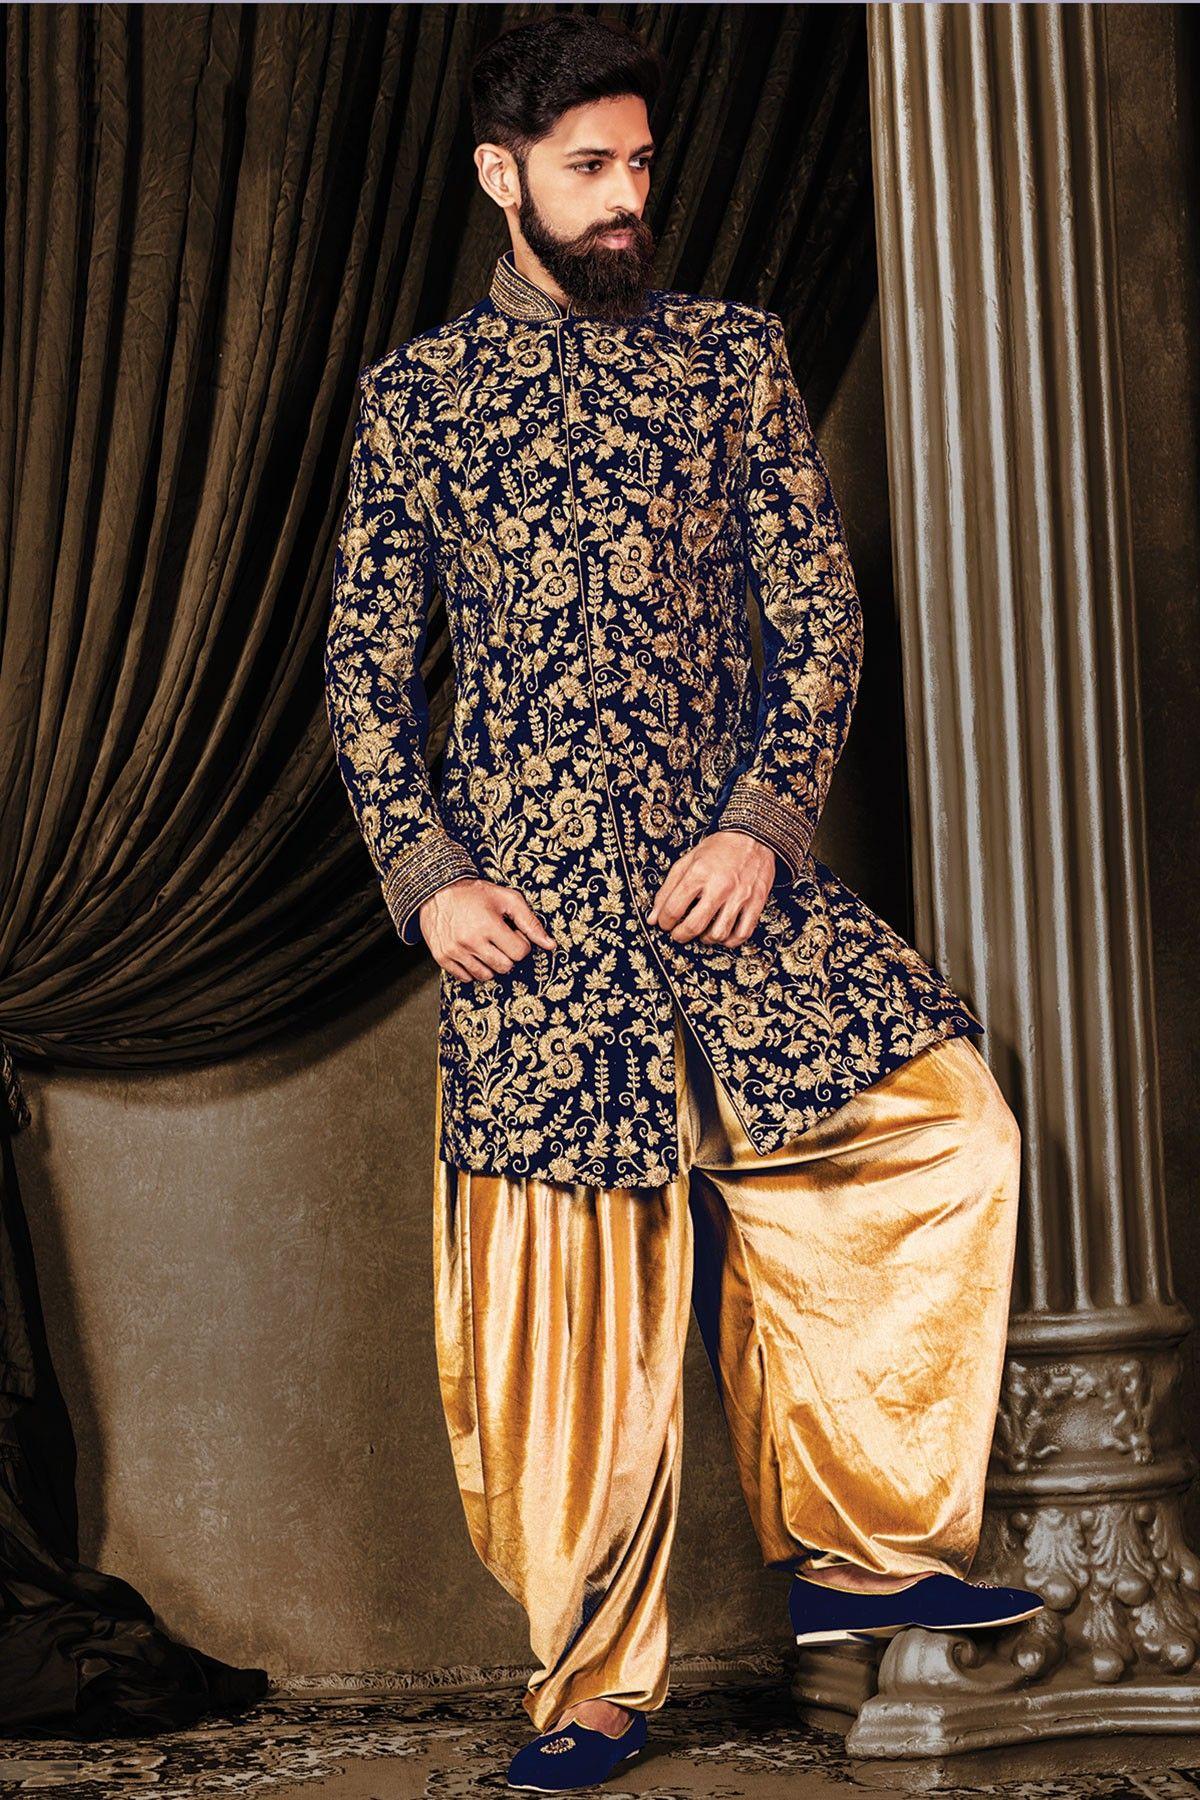 57996f2410 Buy Samyakk Royal Blue Silk Embroidered indo western Sherwani online in  India at best price.Buy IndoWestern Sherwani Royal Blue Zari Work Online